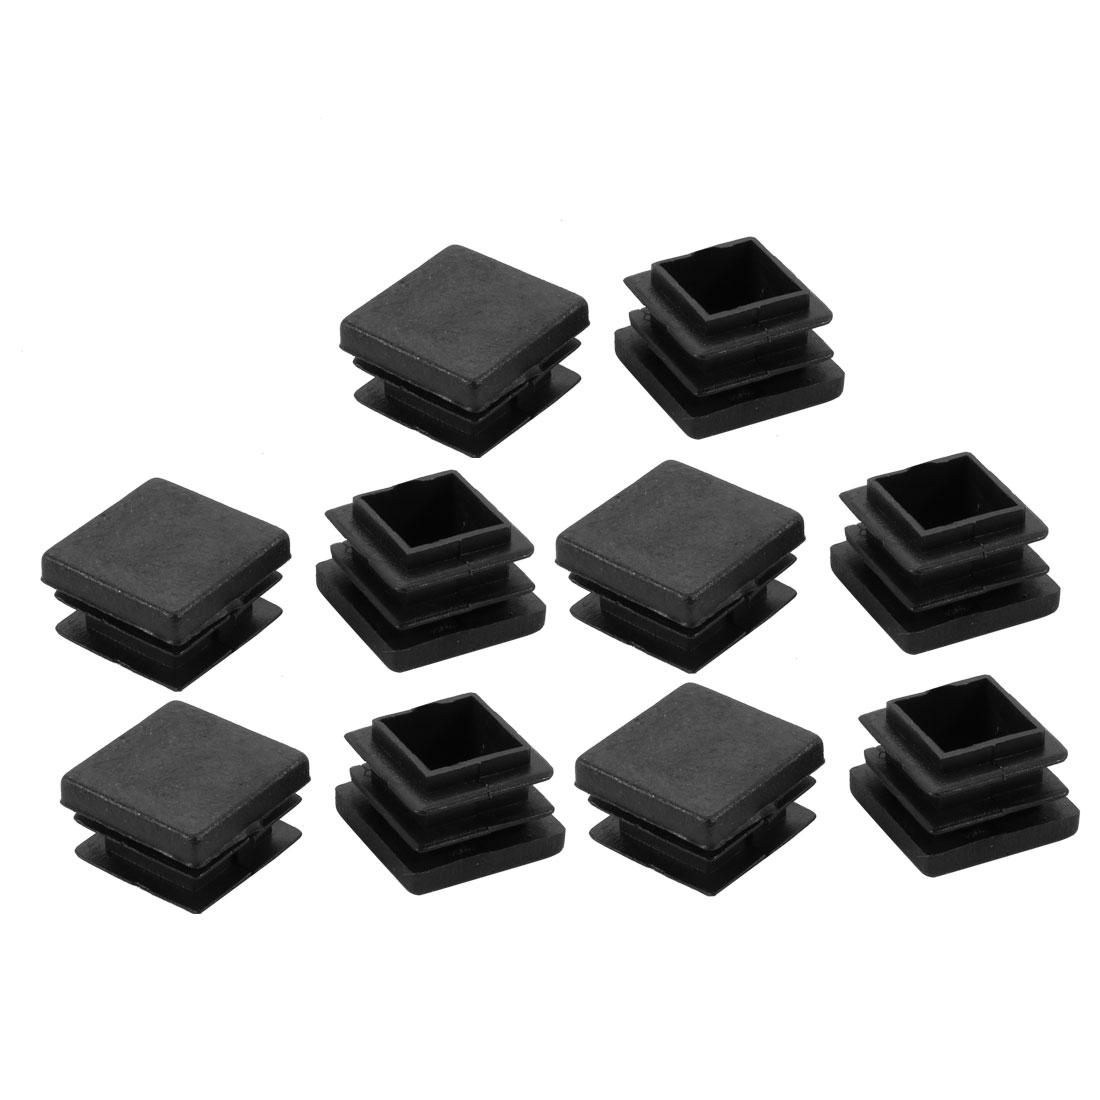 10pcs 22mmx22mm Black Plastic Square Chair Leg Floor Insert Cover Protector